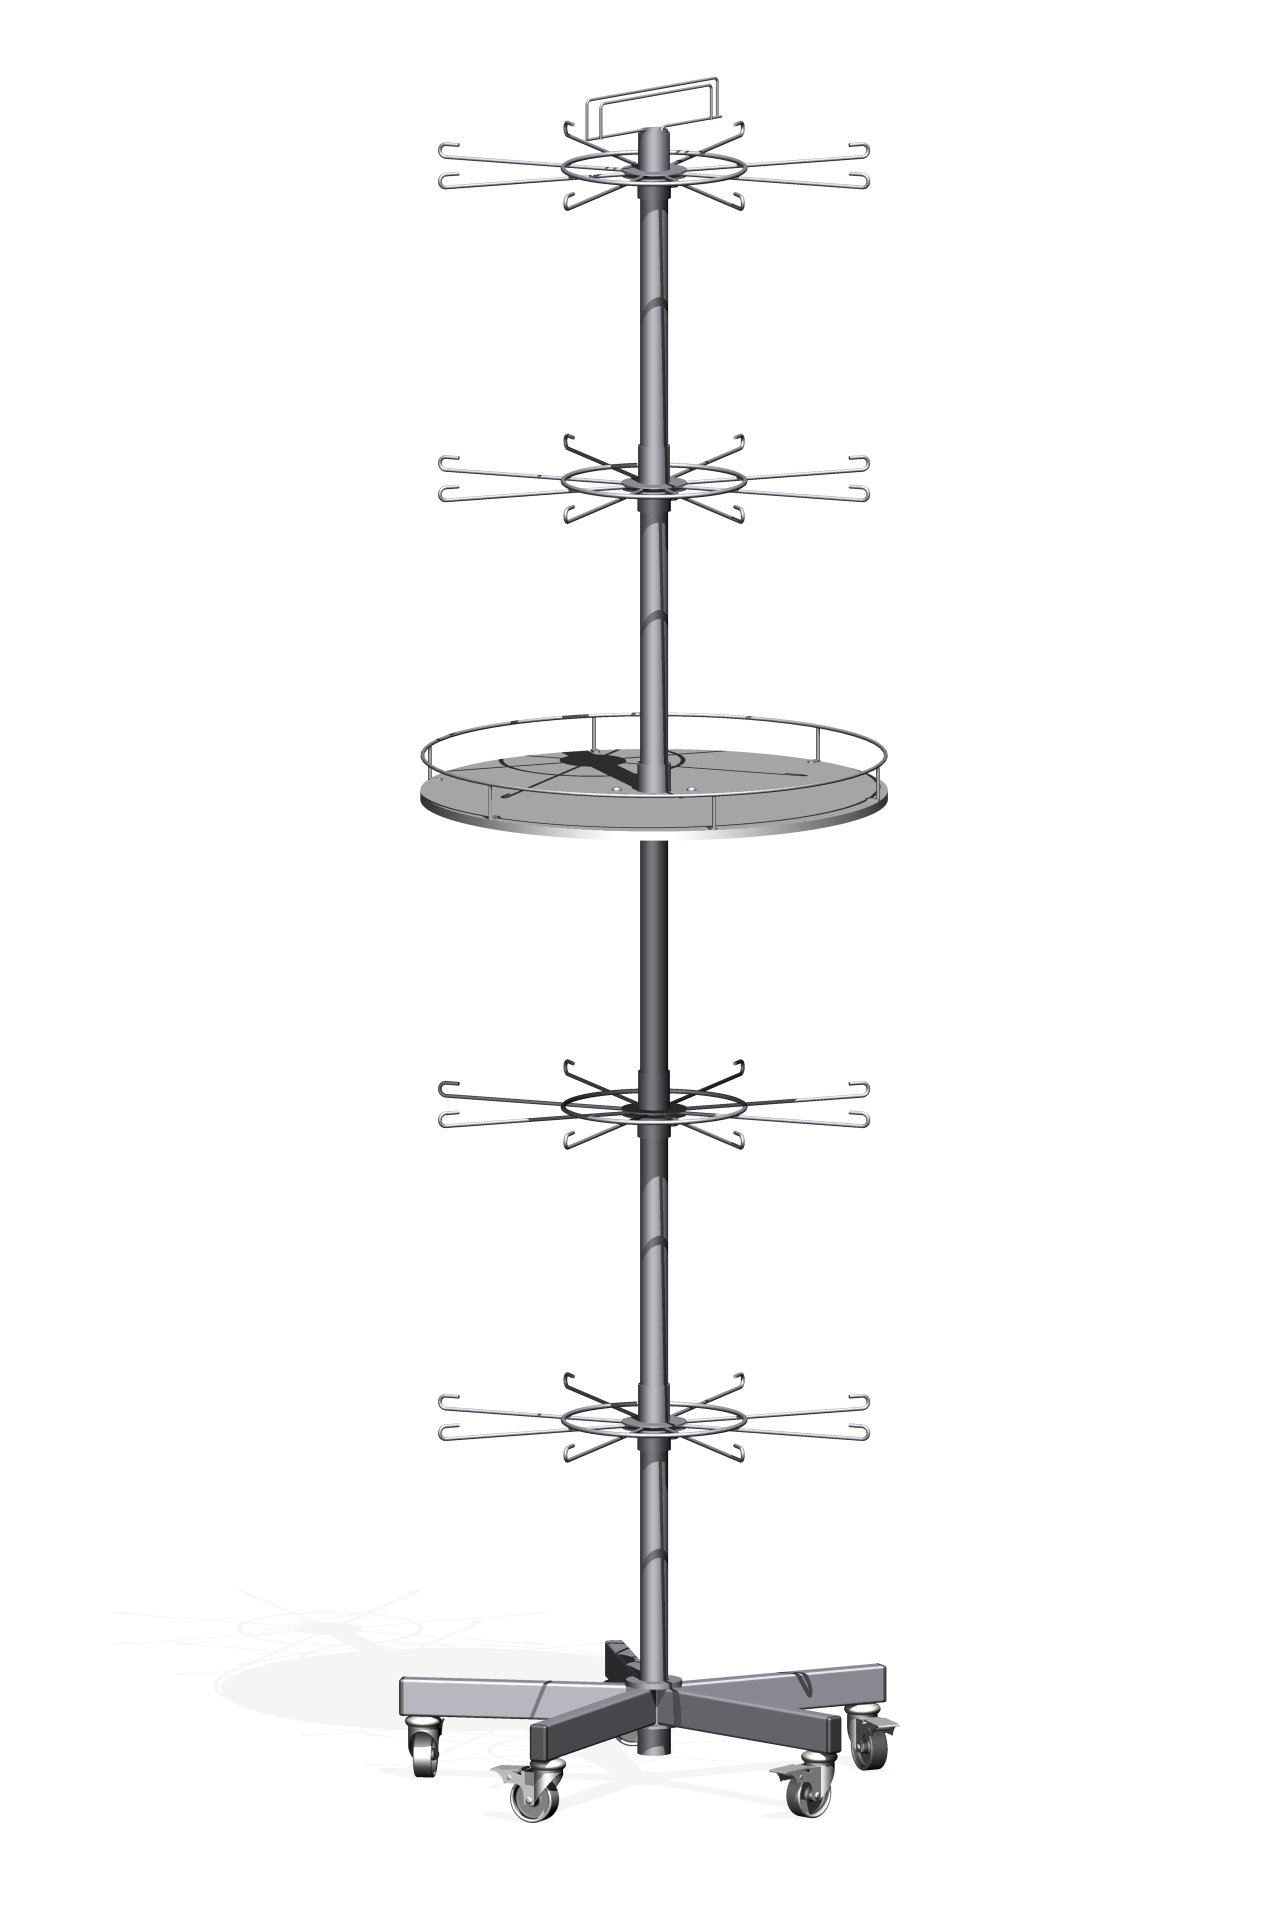 lc 1403 14 50 buyck displays. Black Bedroom Furniture Sets. Home Design Ideas